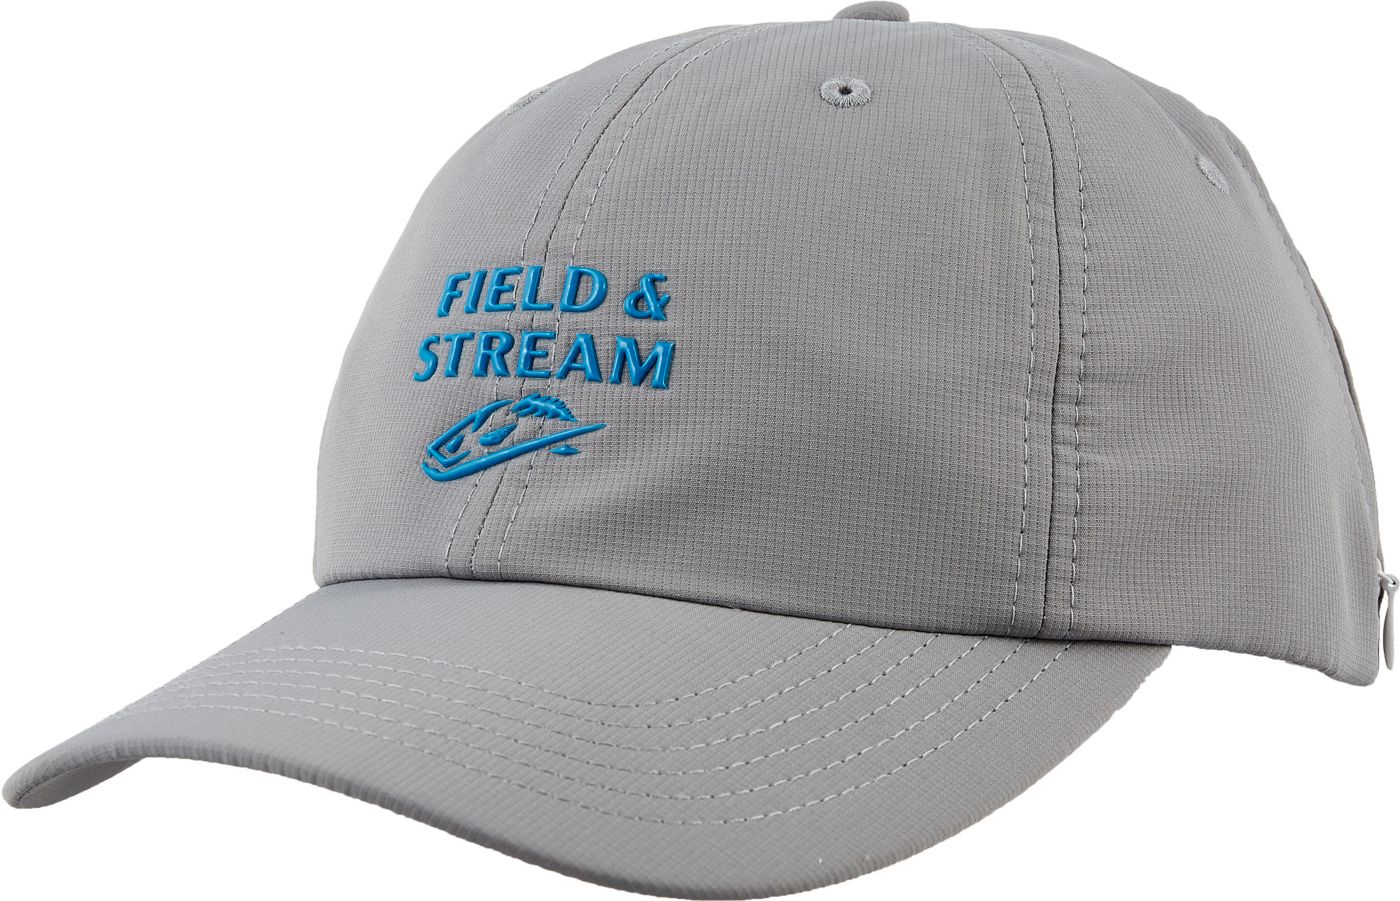 Field & Stream Men's Technical Zipper Hat